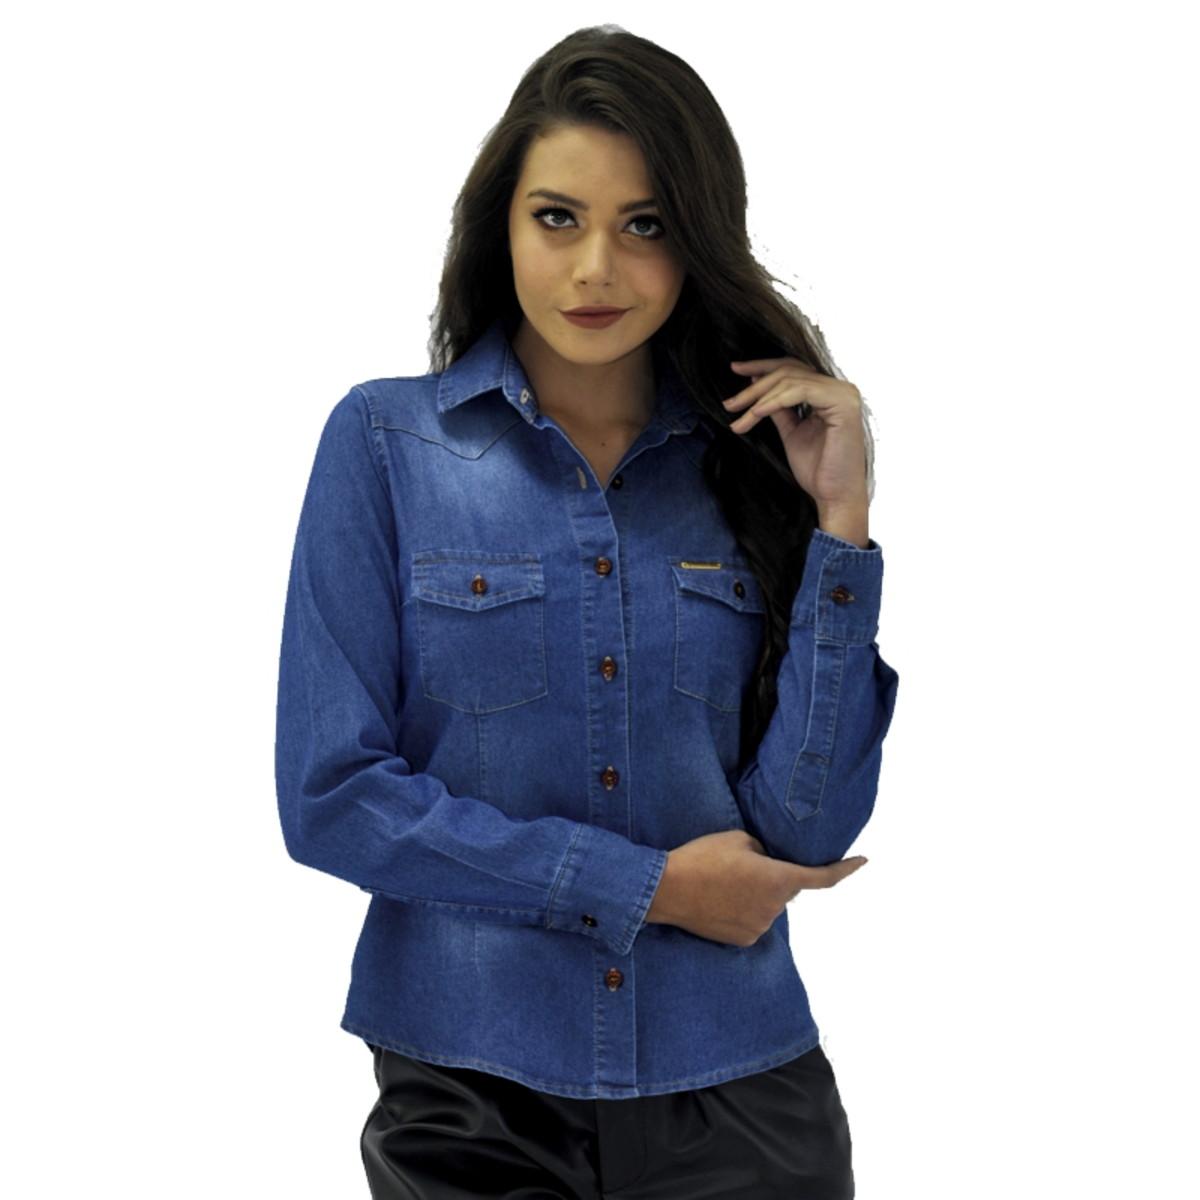 a6d2abb570 Camisa Feminina Jeans Manga Longa no Elo7